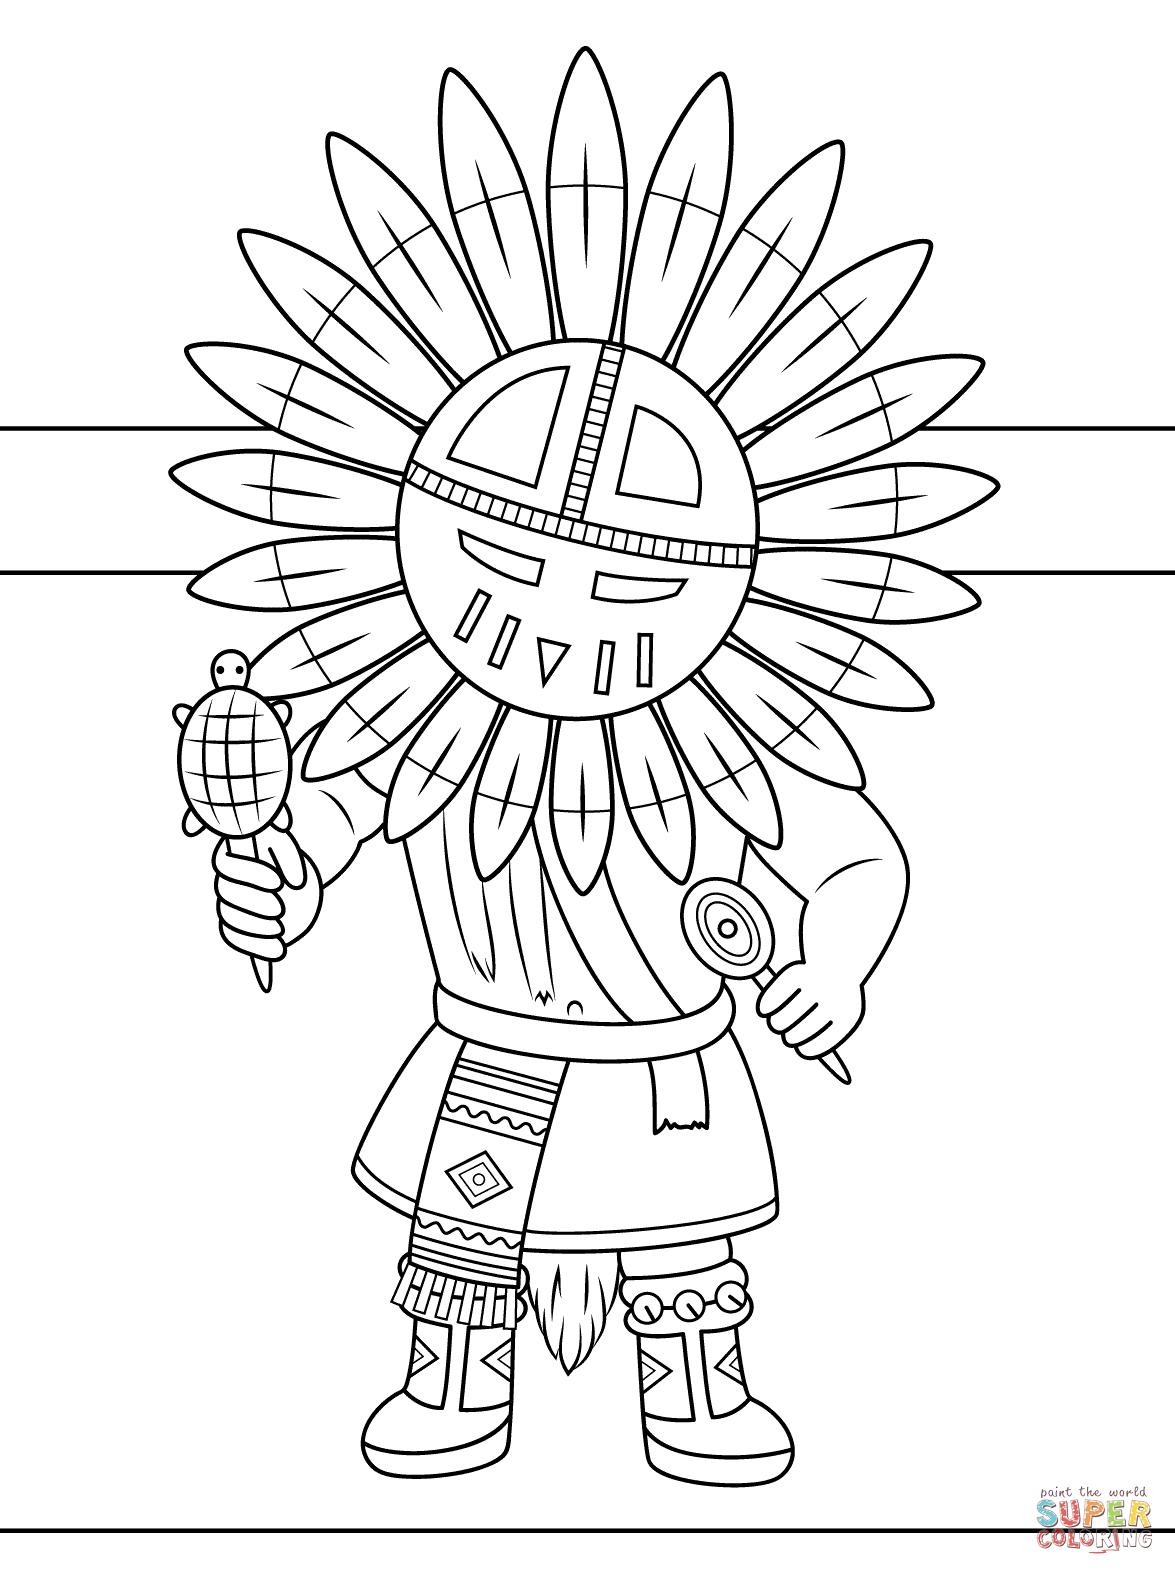 Native American Drawing Ideas At Getdrawings